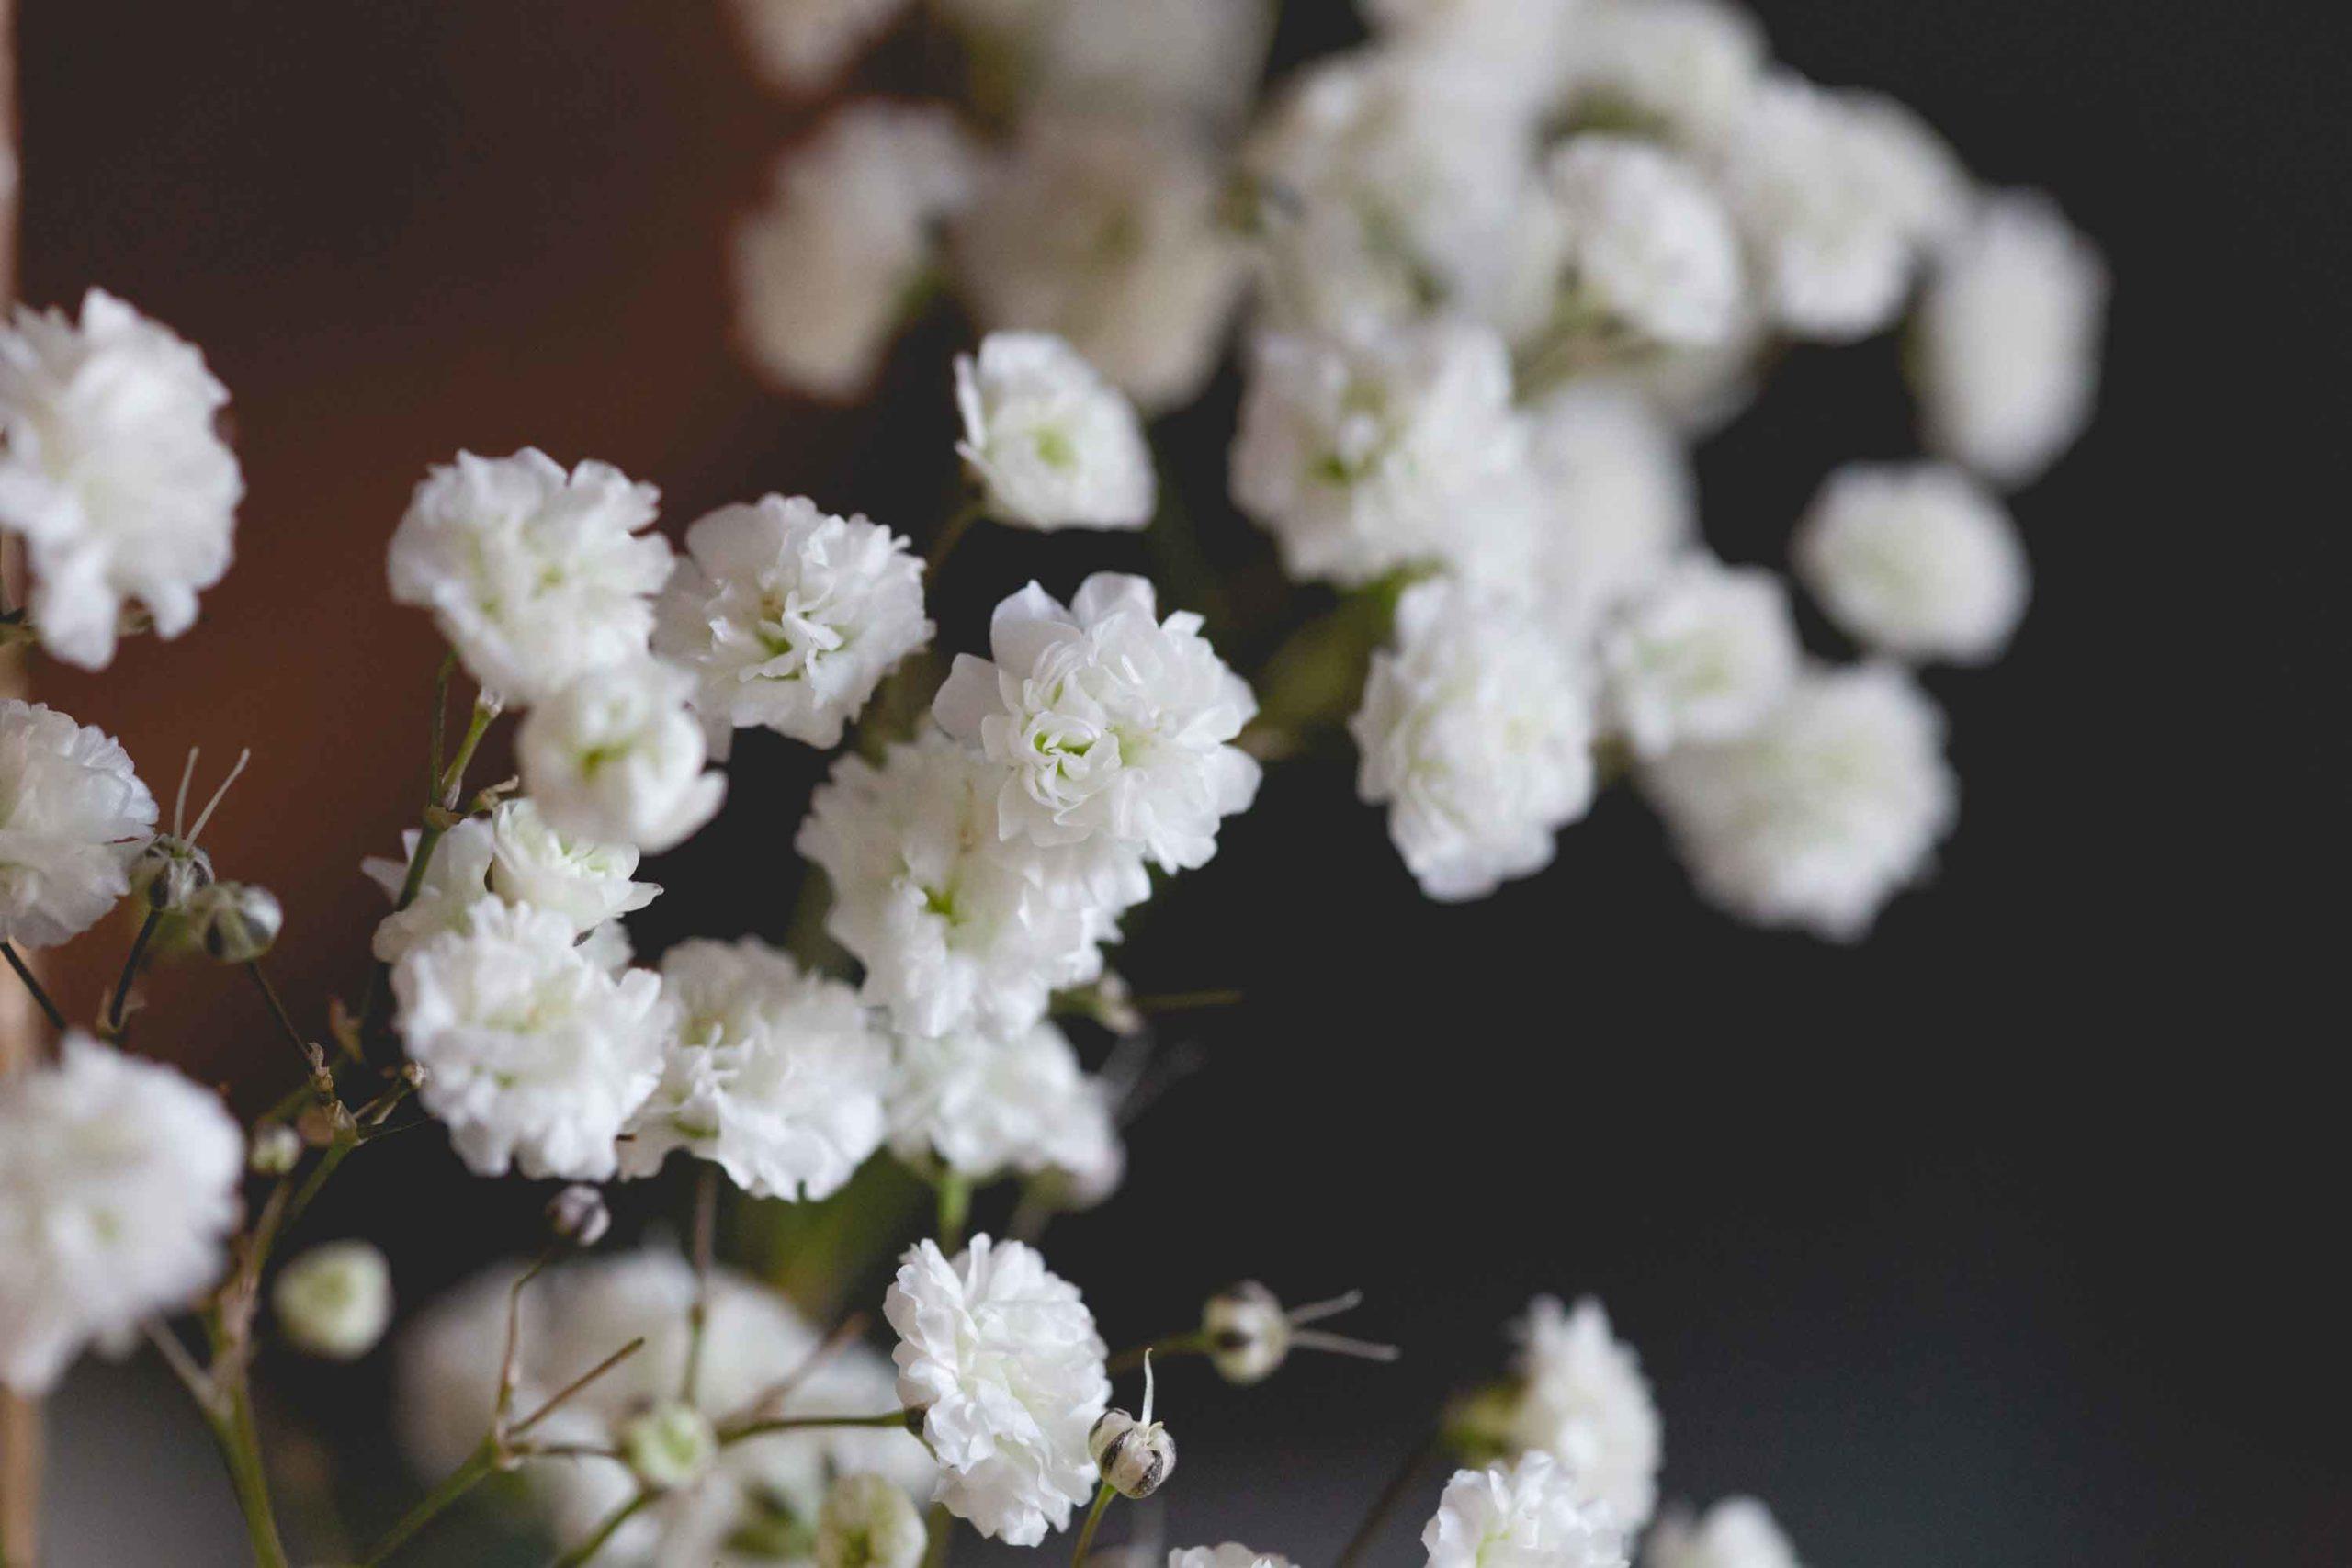 gypsophila-de-i-fiori-di-vale